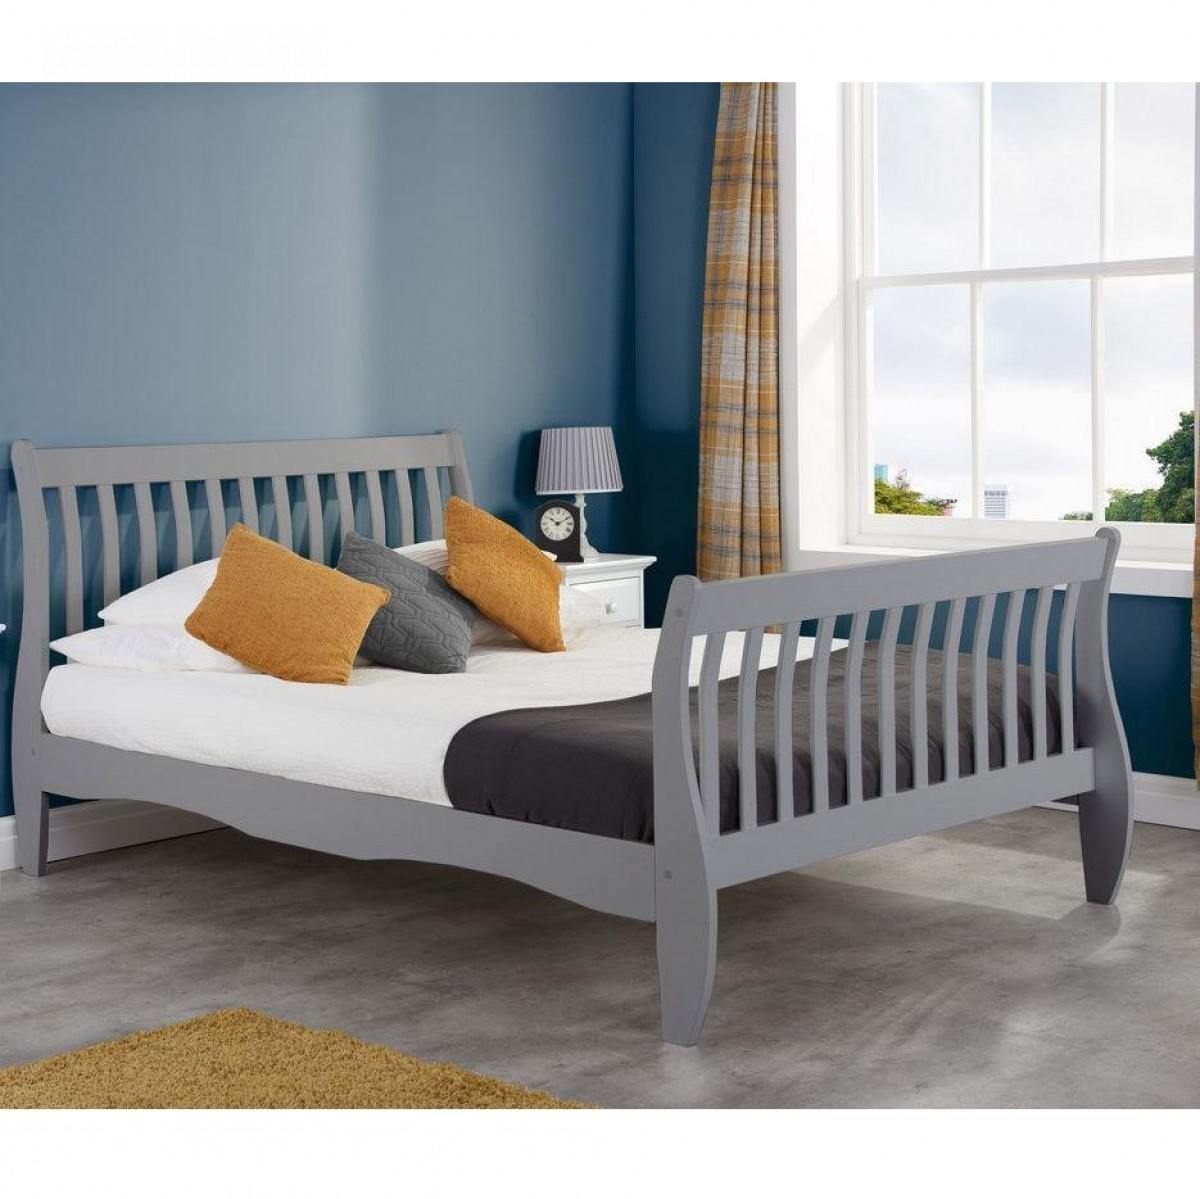 Belford Grey Wooden Sleigh Bed